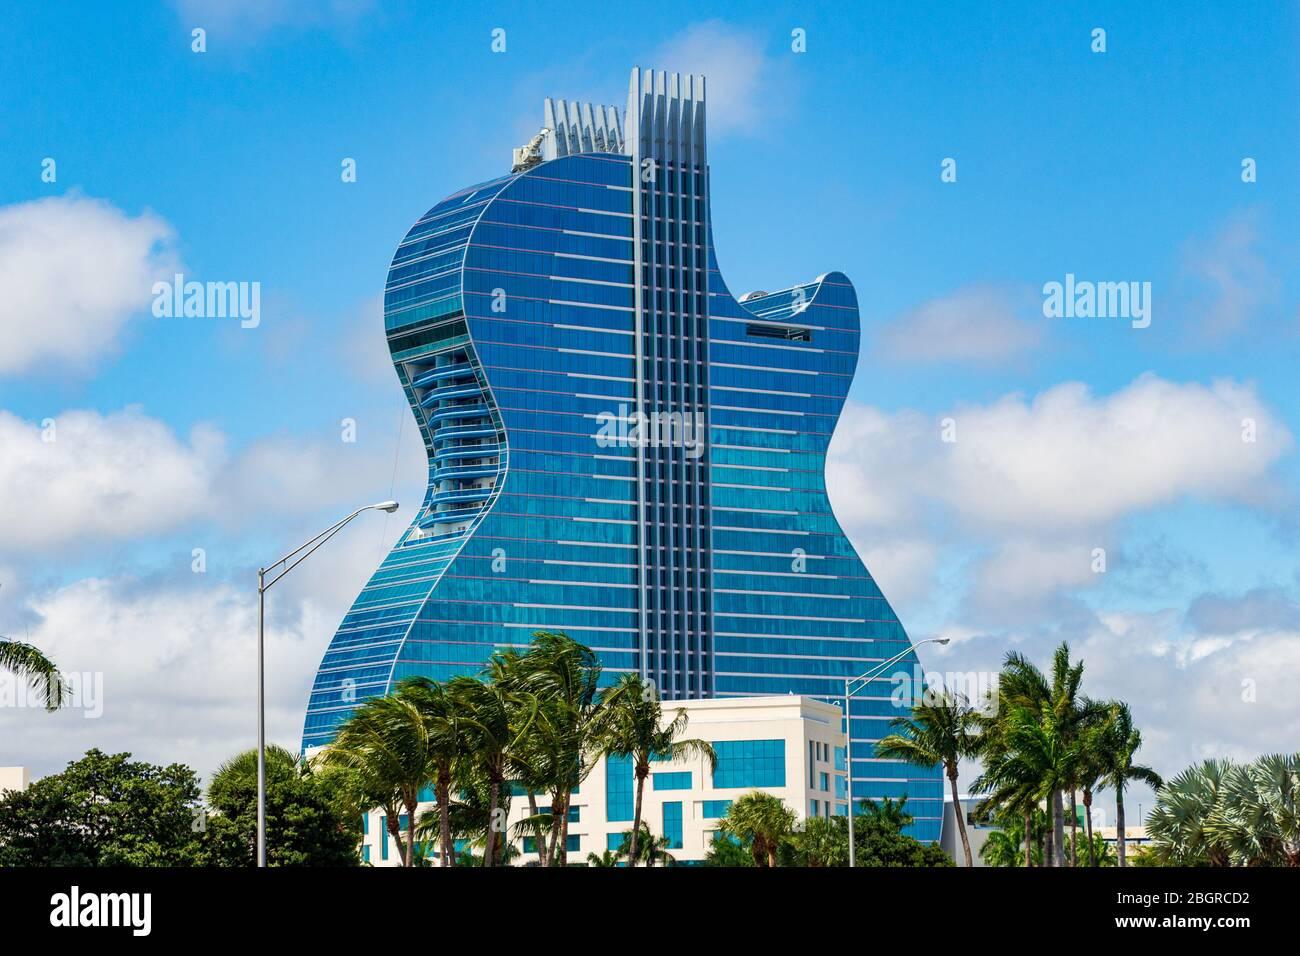 Crocodile rock casino address in hollywood florida rt 66 casino pink floyd